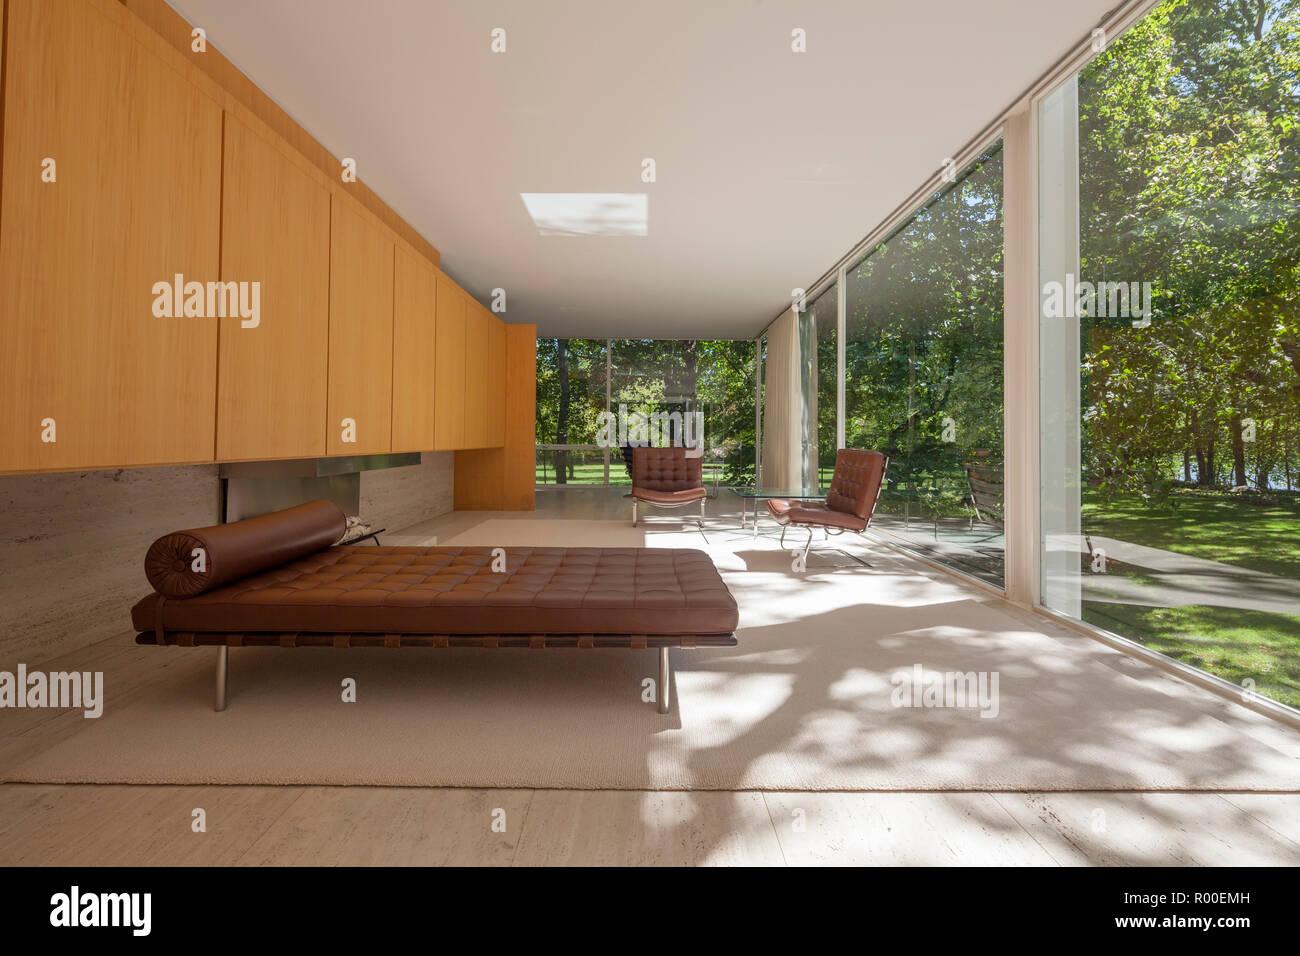 Living room interior of farnsworth house by architect ludwig mies van der rohe 1951 plano illinois usa